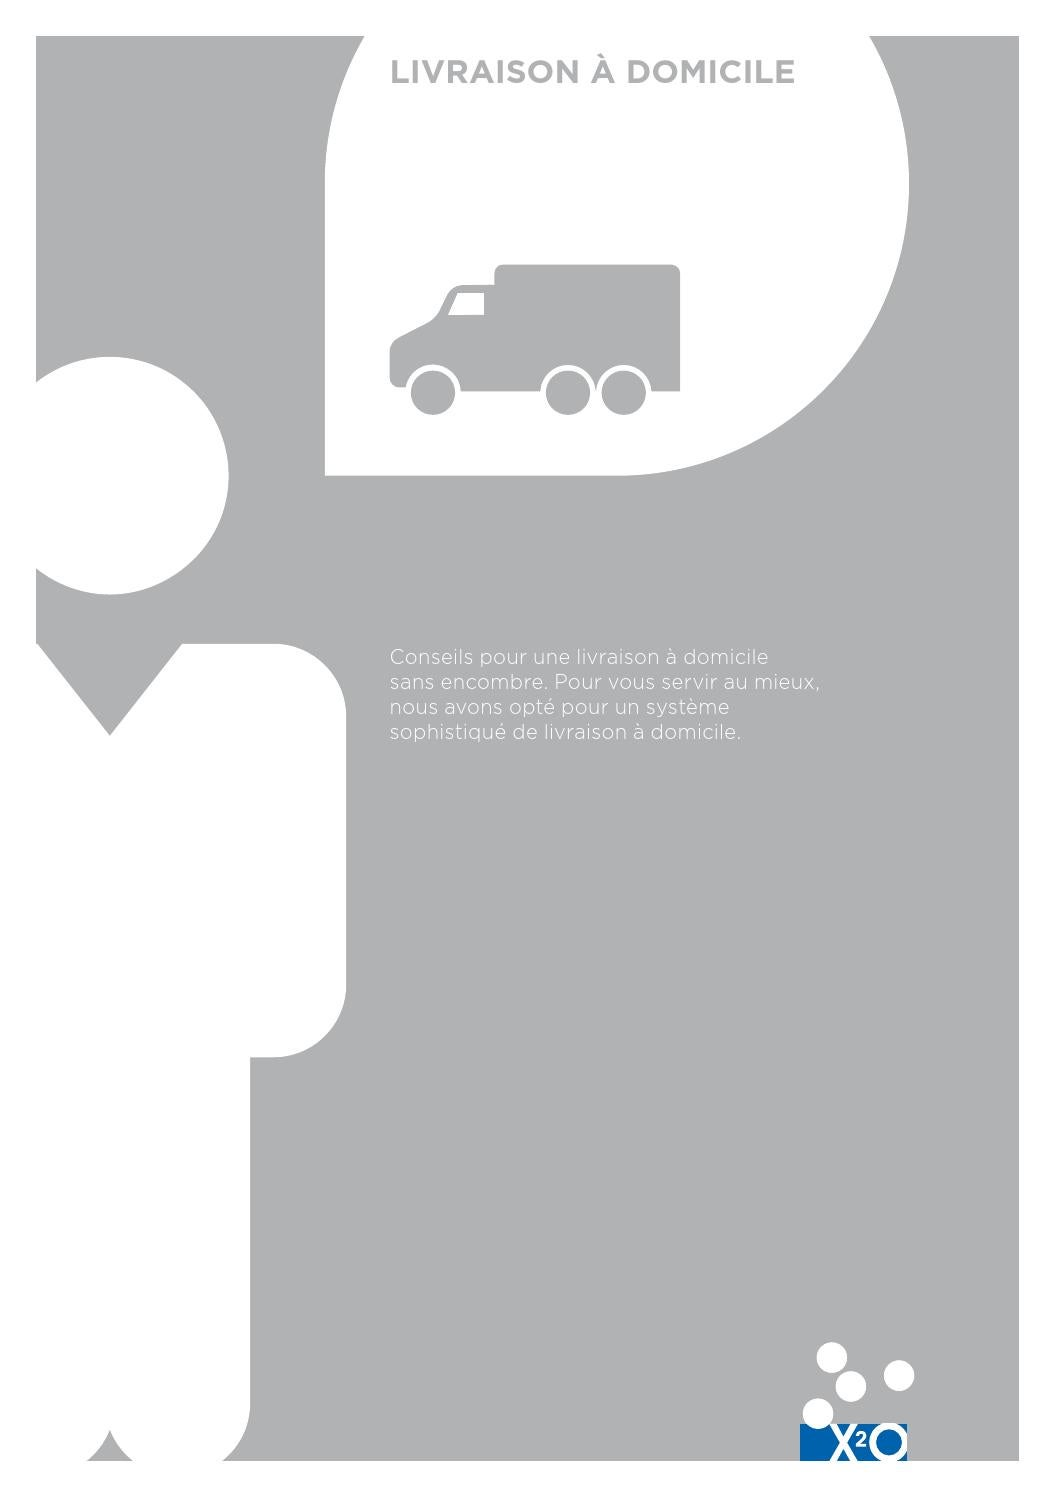 x2o folder livraison domicile by x2o sanitary issuu. Black Bedroom Furniture Sets. Home Design Ideas